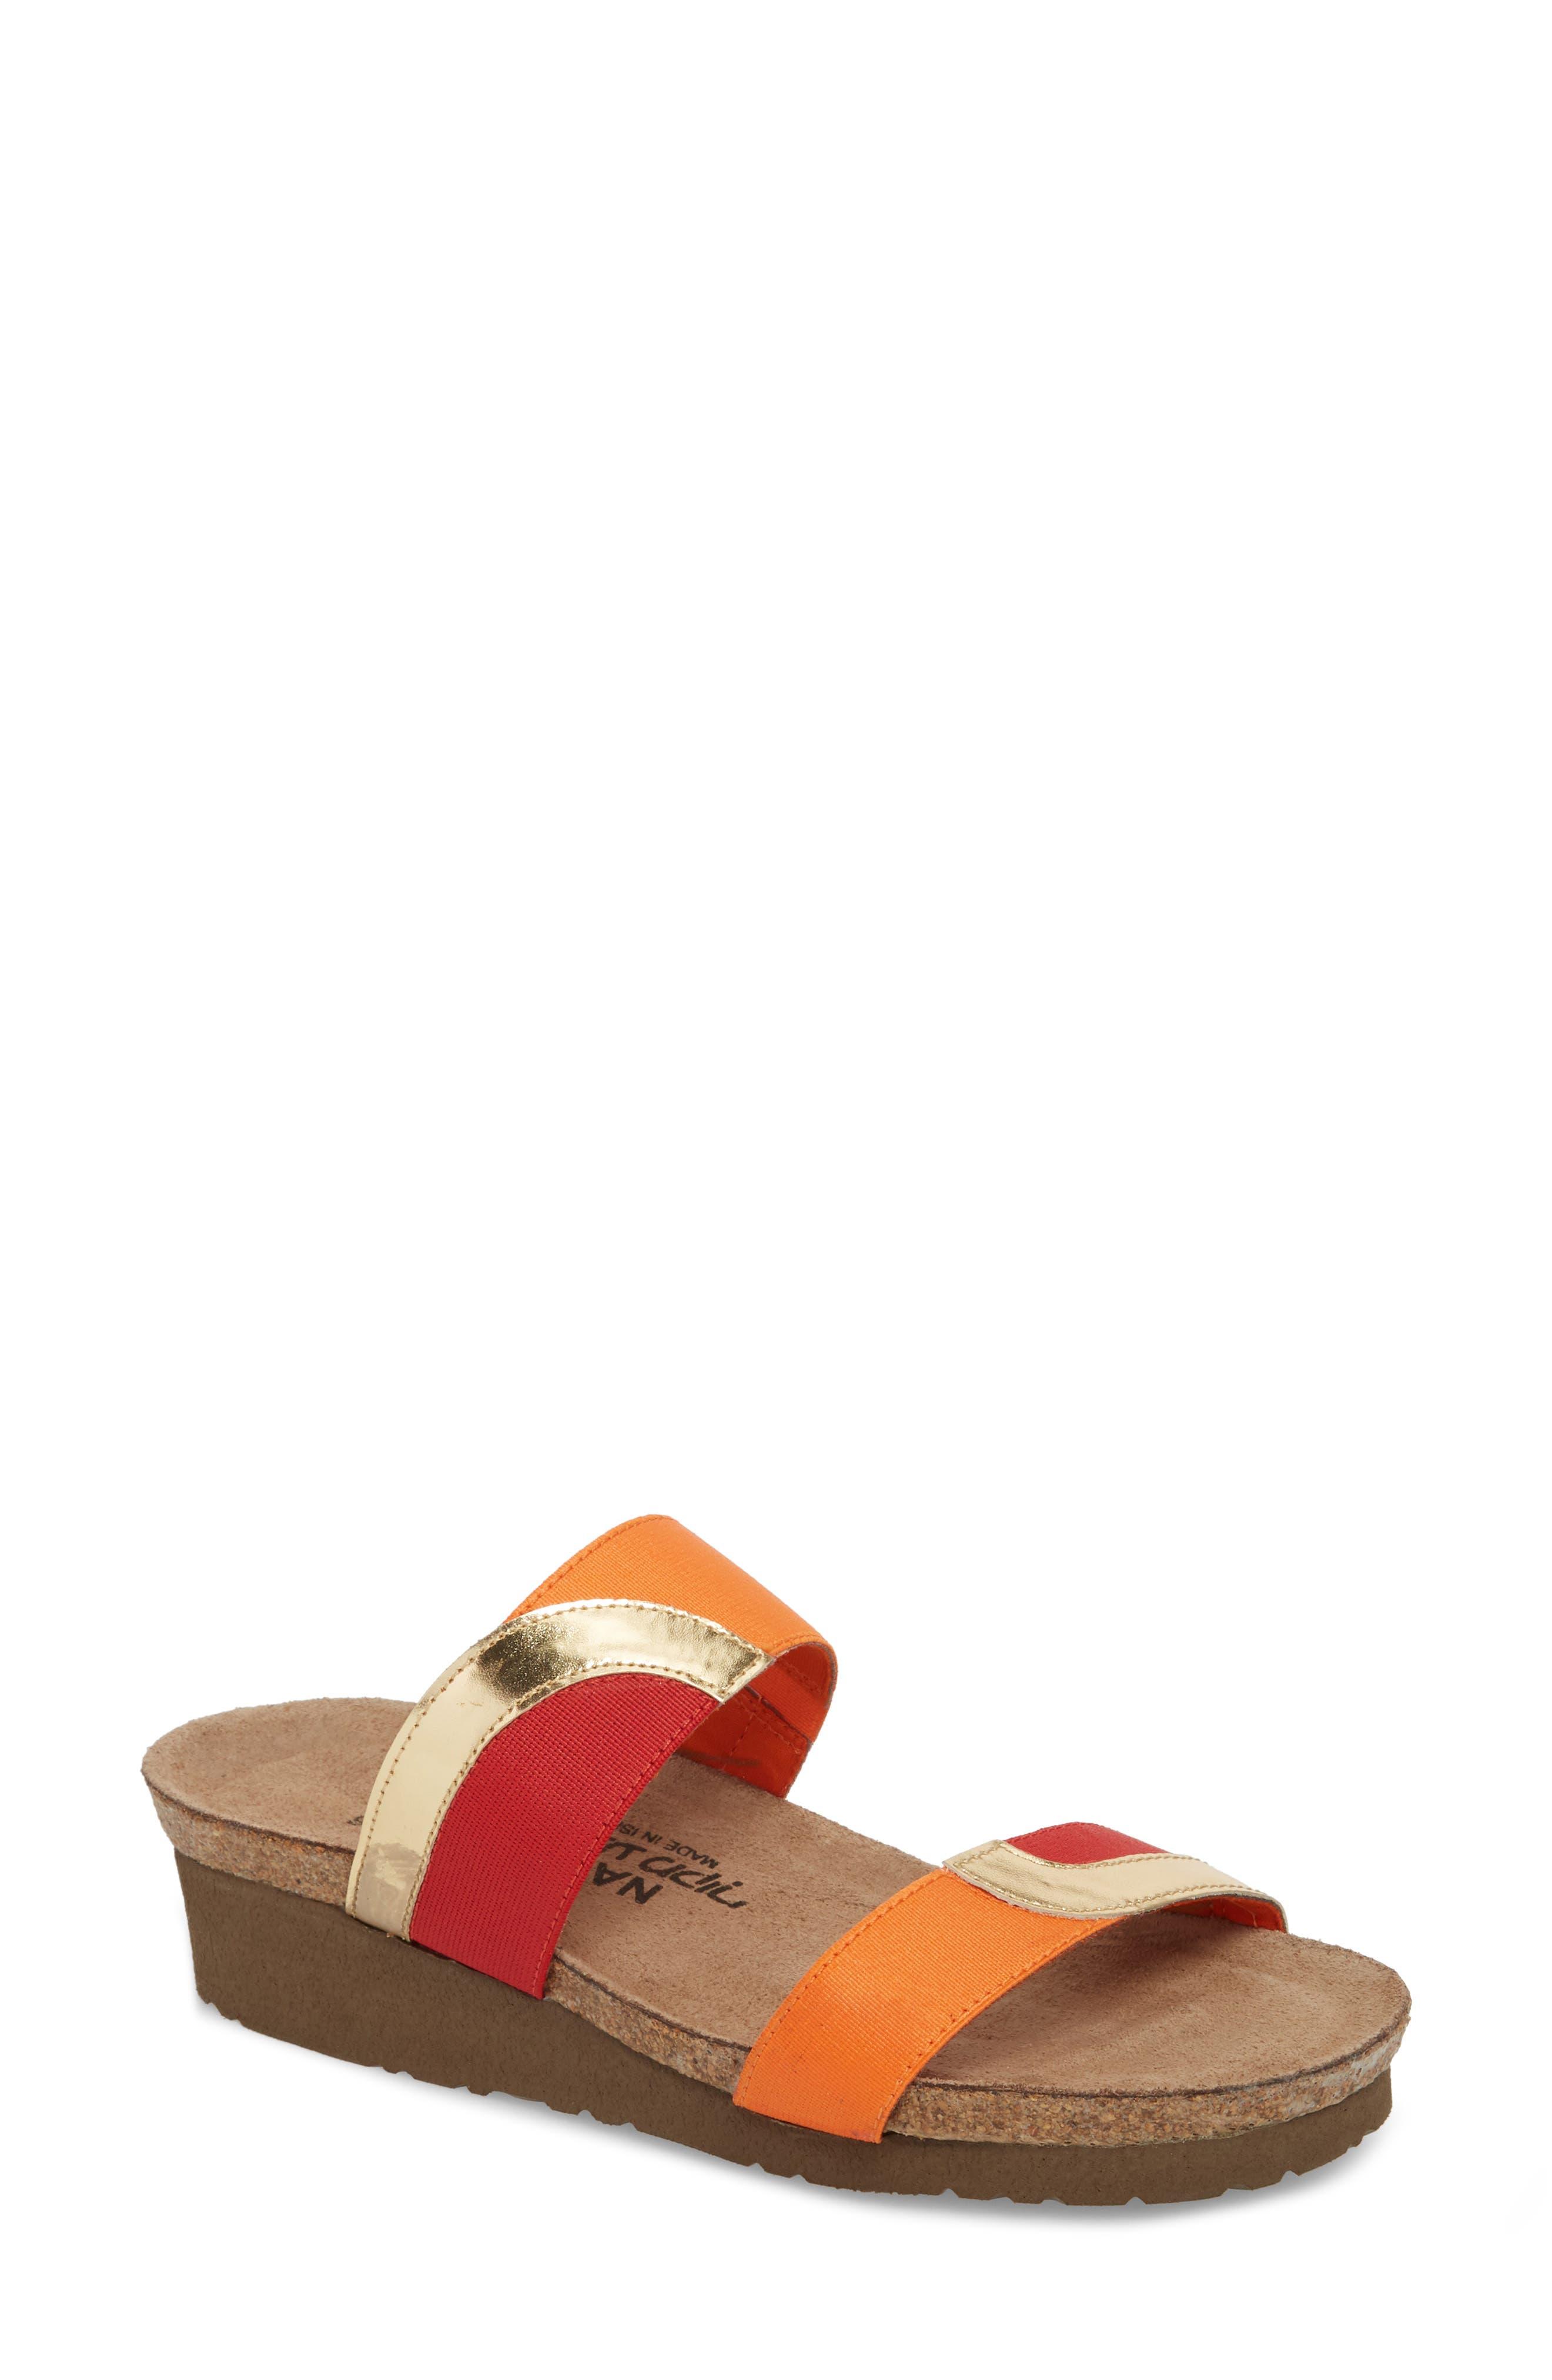 Frankie Slide Sandal,                             Main thumbnail 1, color,                             Red/ Orange/ Gold Leather